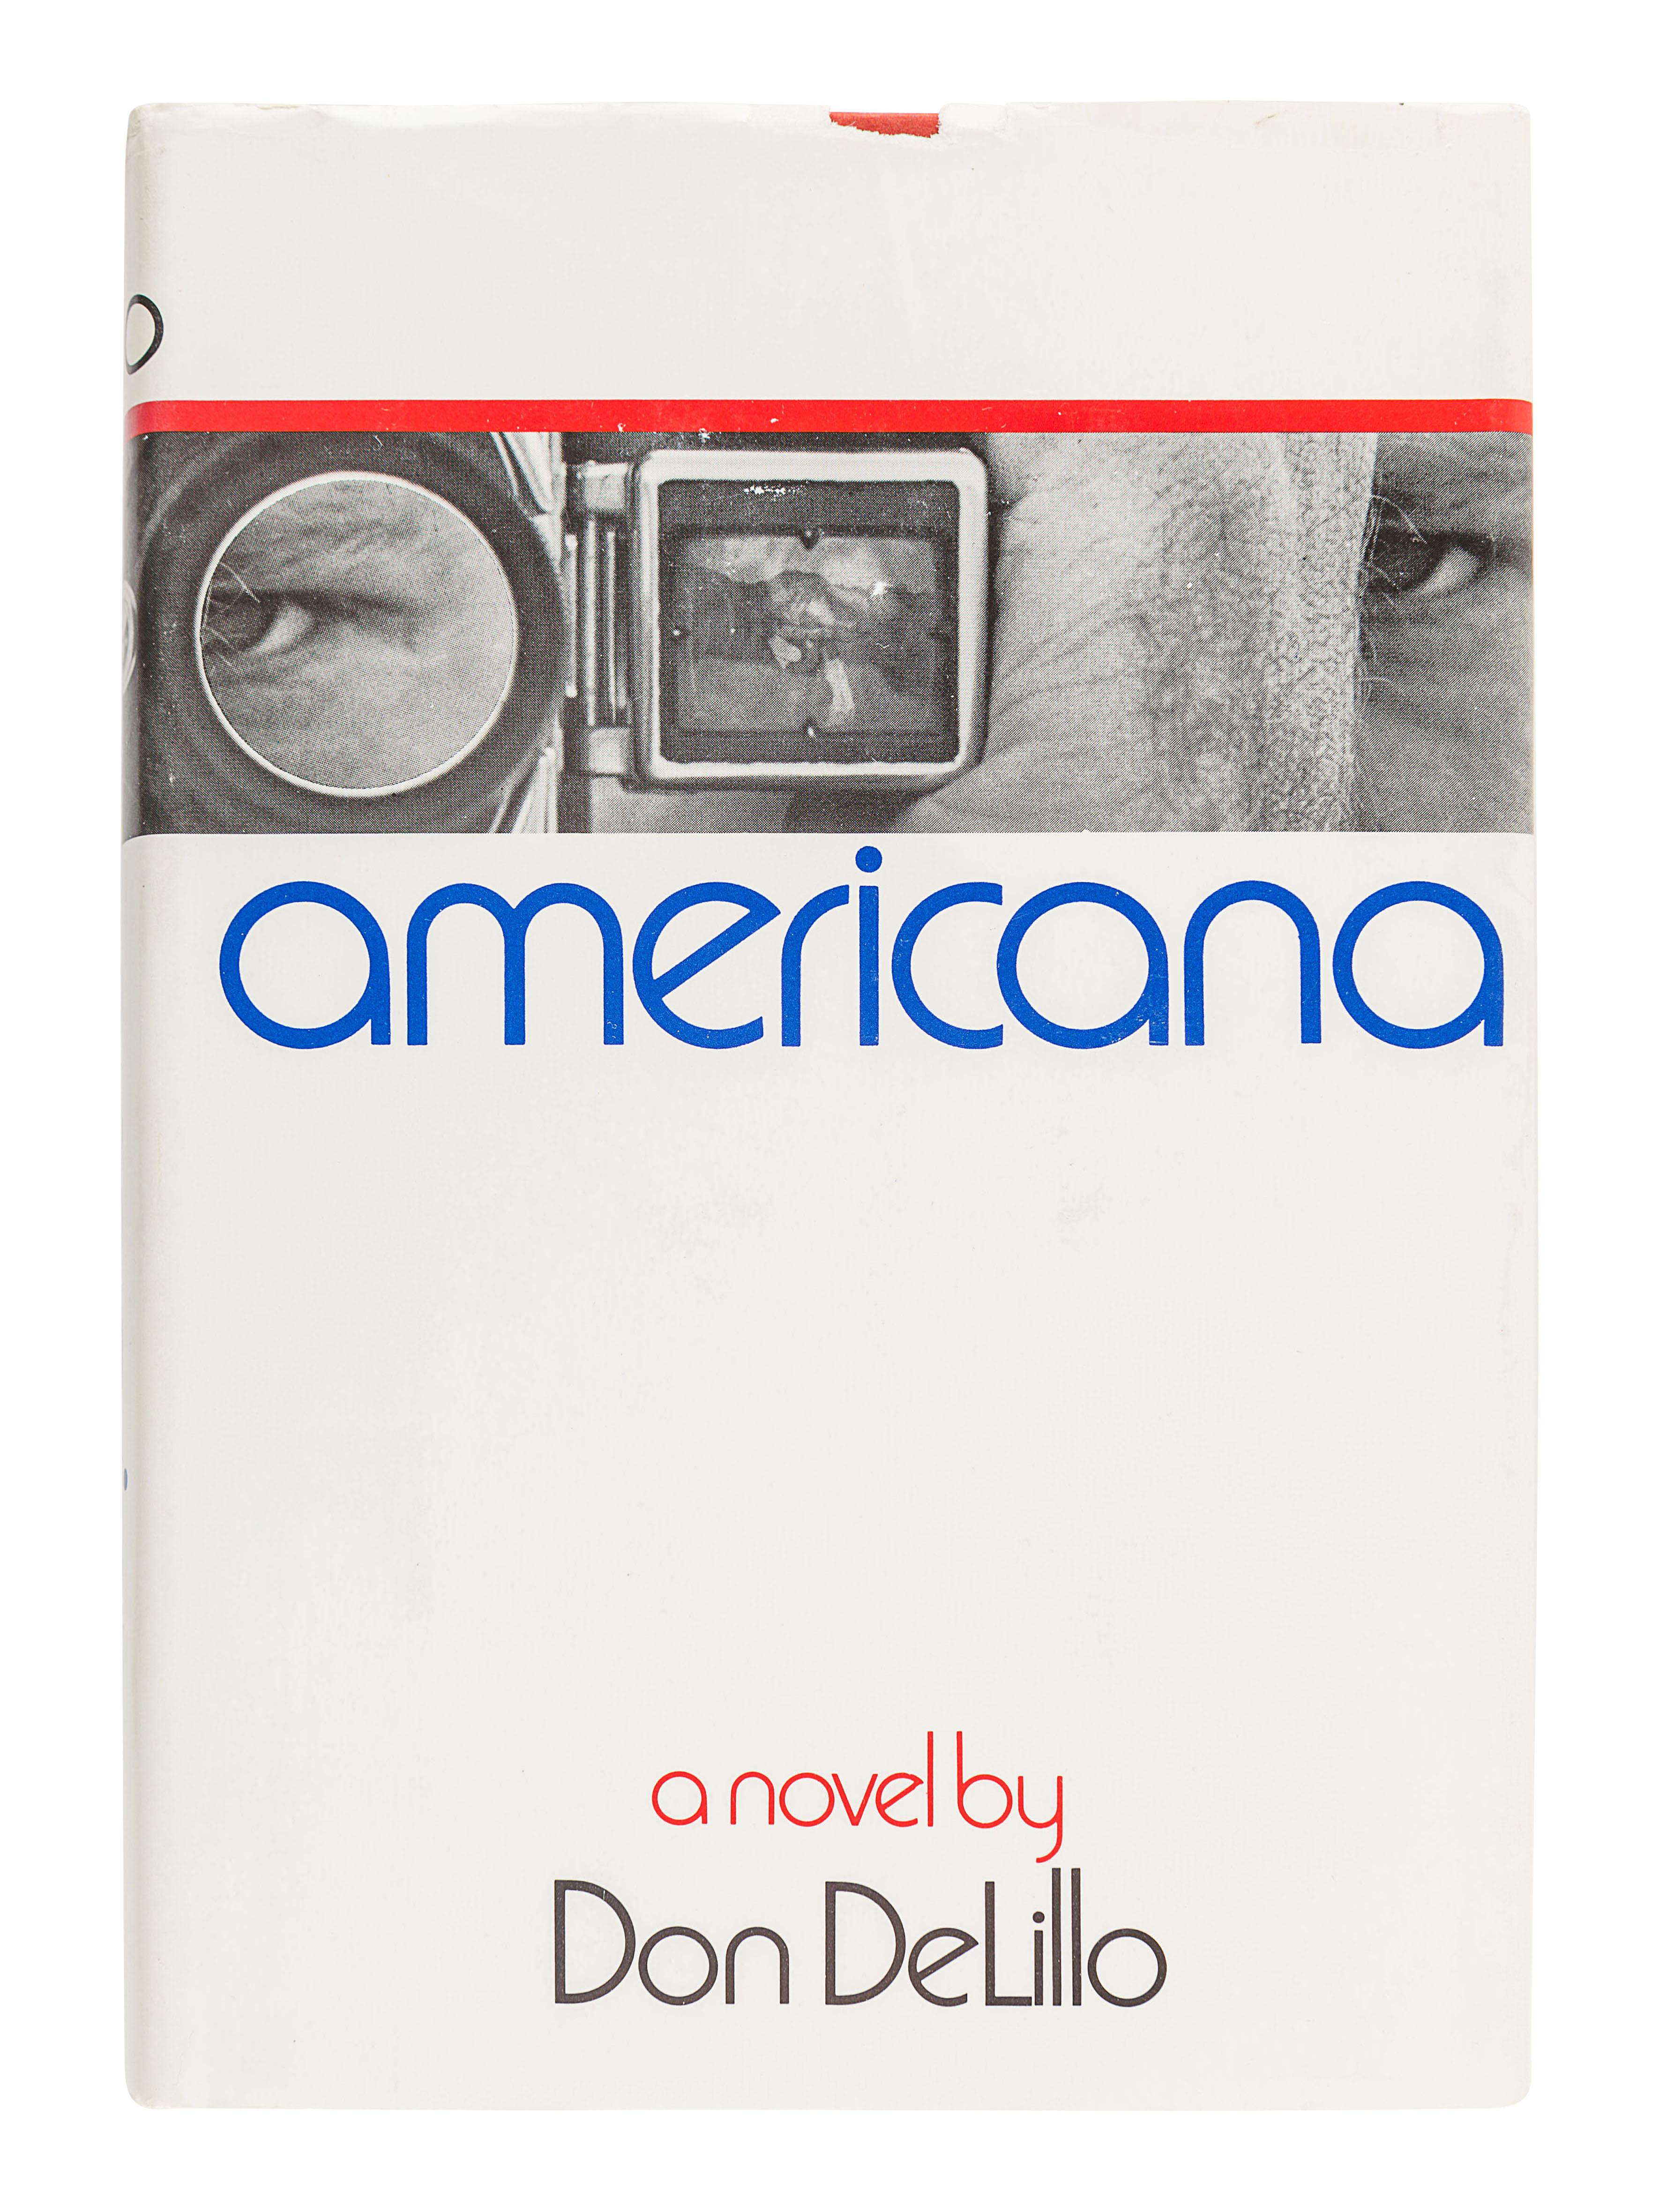 DELILLO, Don (b. 1936). Americana. Boston: Houghton Mifflin Company, 1971.